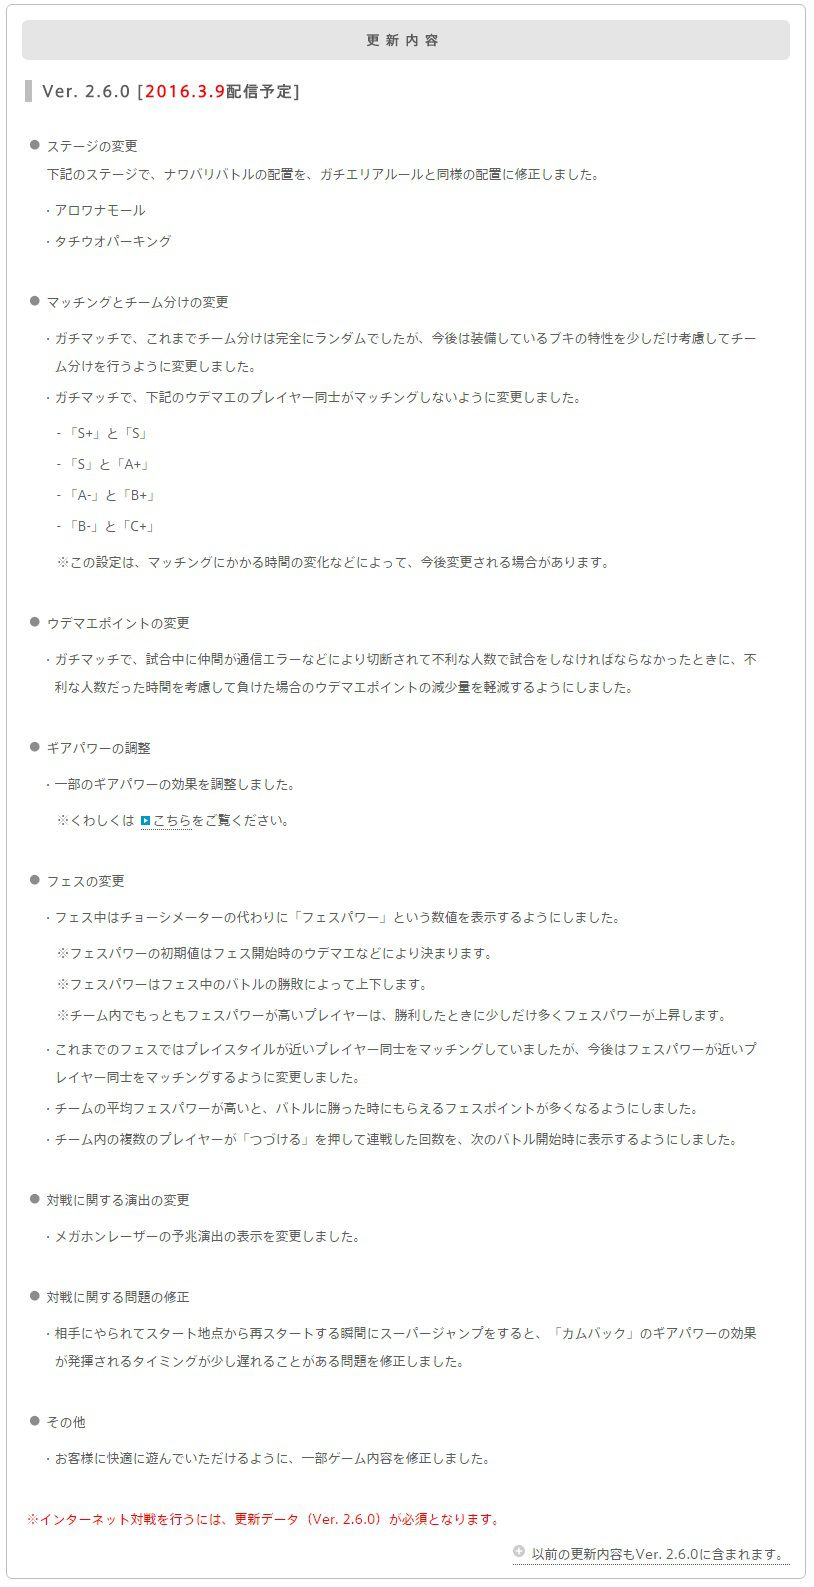 image_4314.jpg